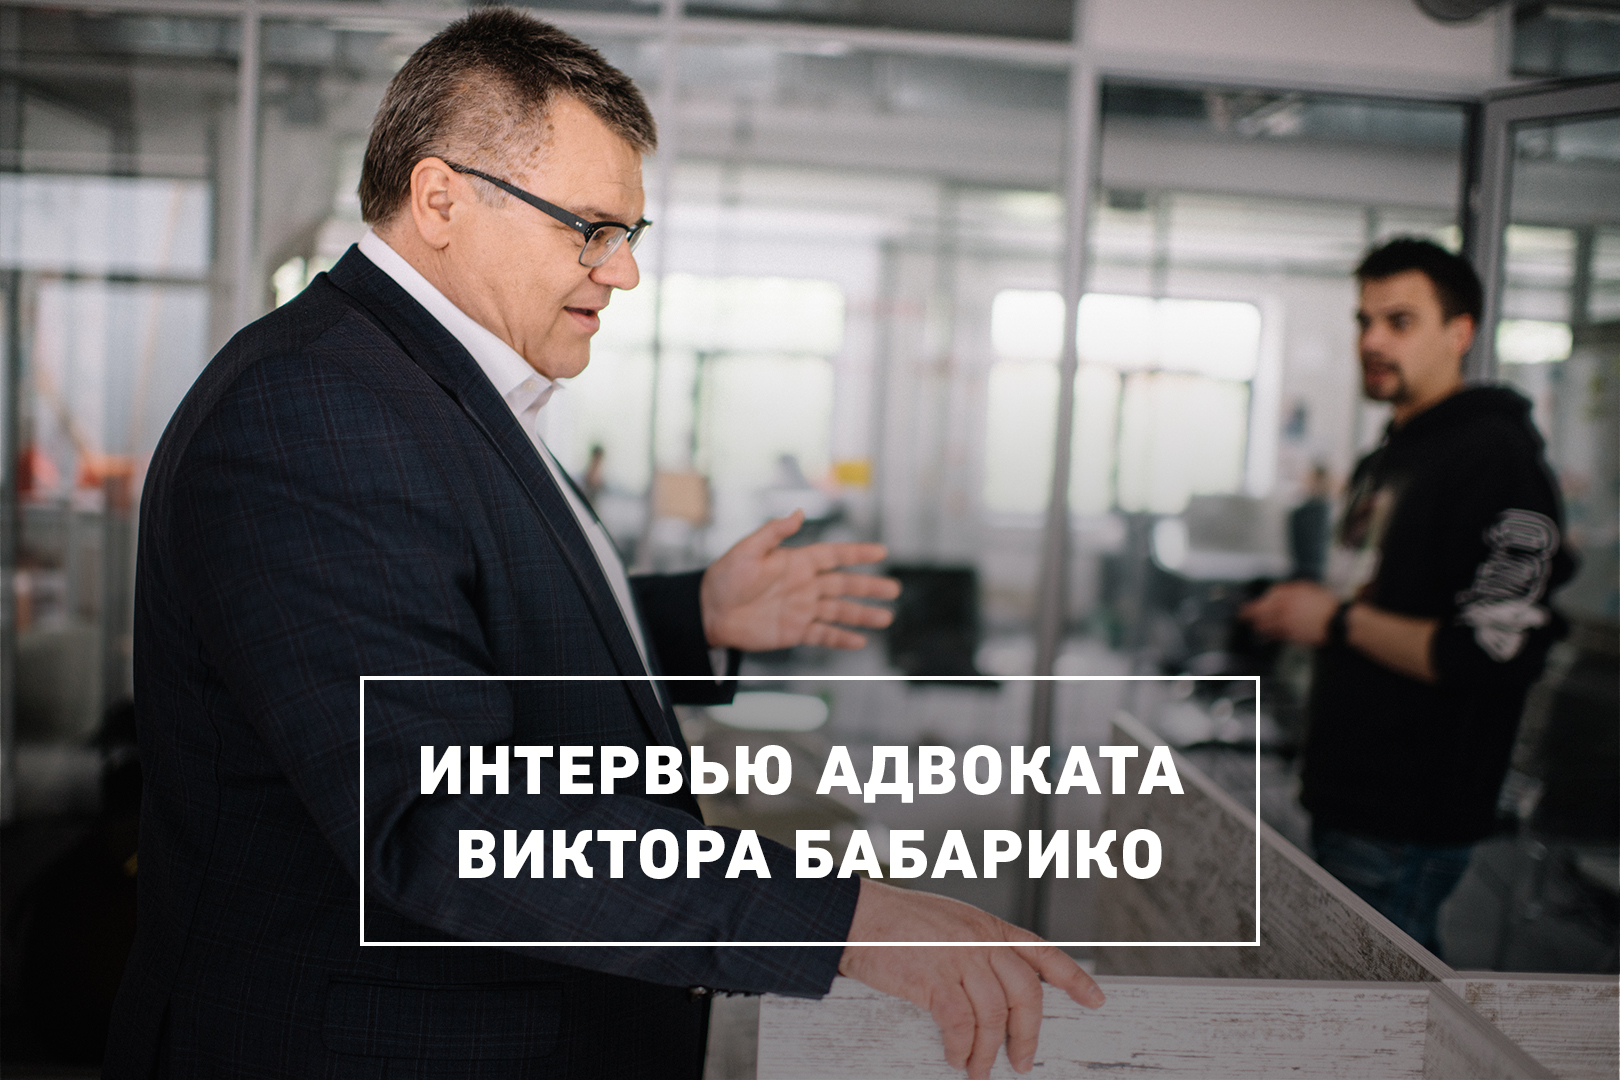 Интервью адвоката Виктора Бабарико